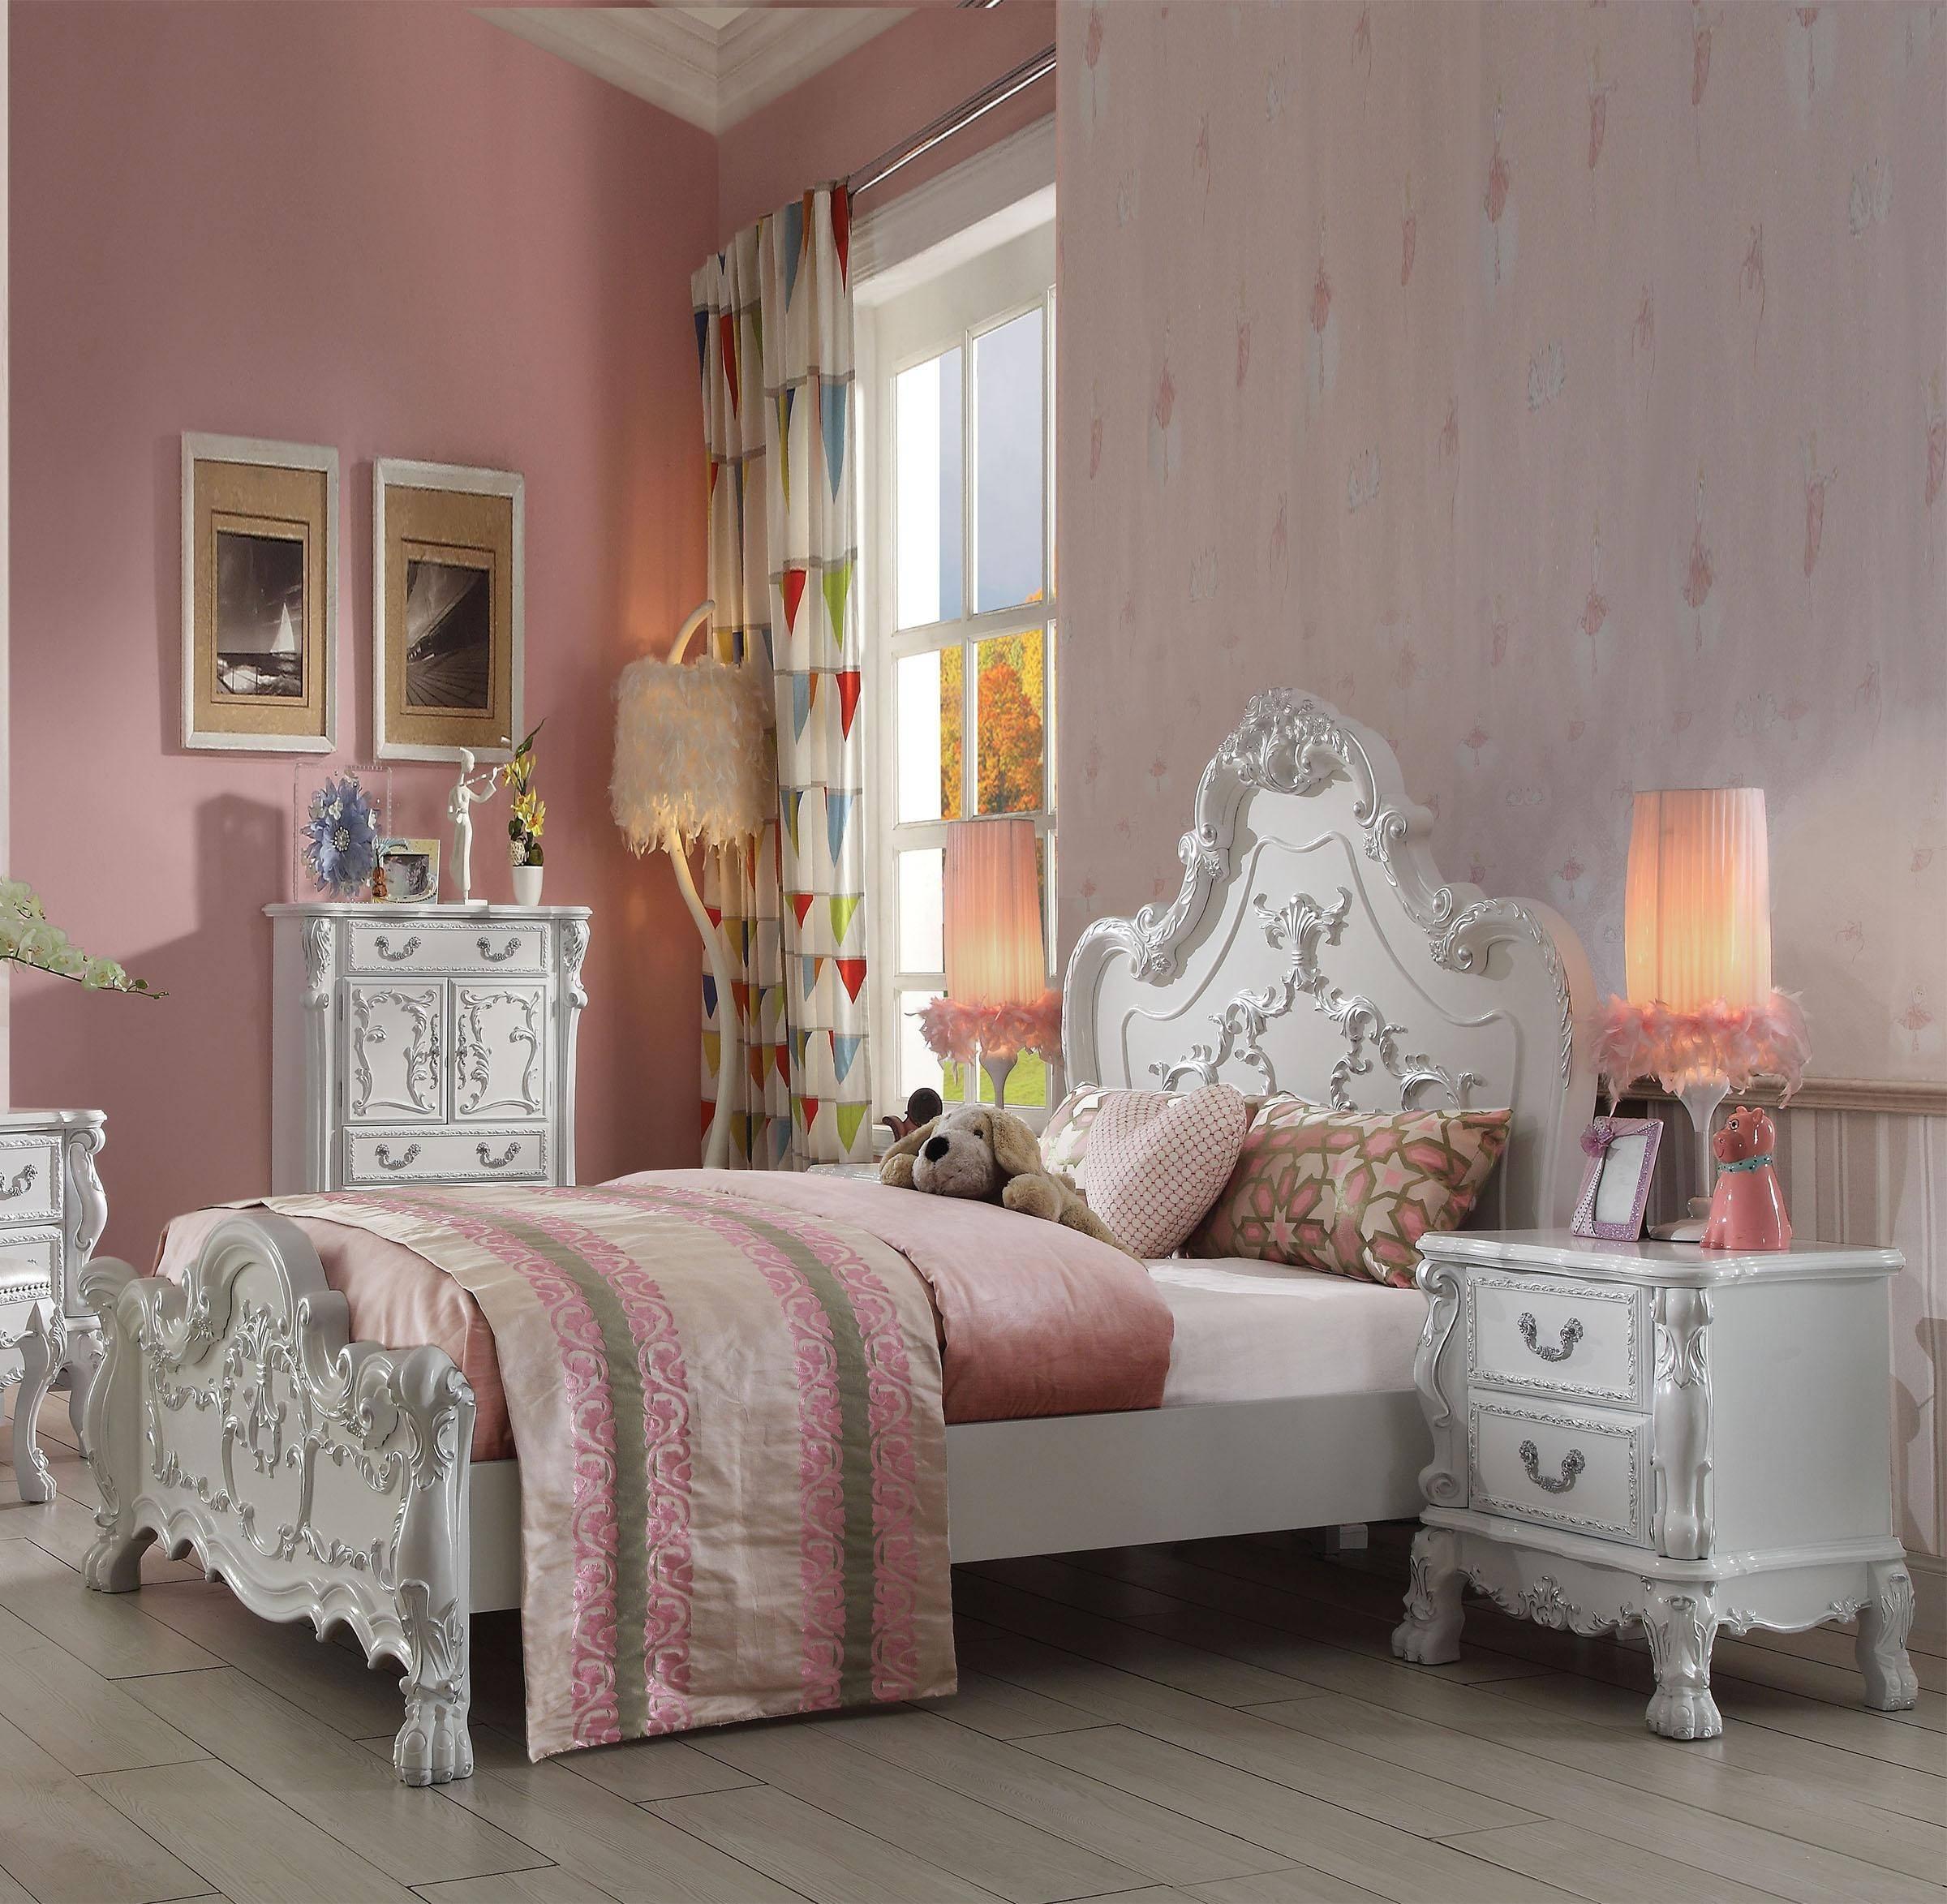 Buy Acme Dresden Kids 30665f Full Panel Bedroom Set 3 Pcs In Antique White Veneers Solid Hardwood Online